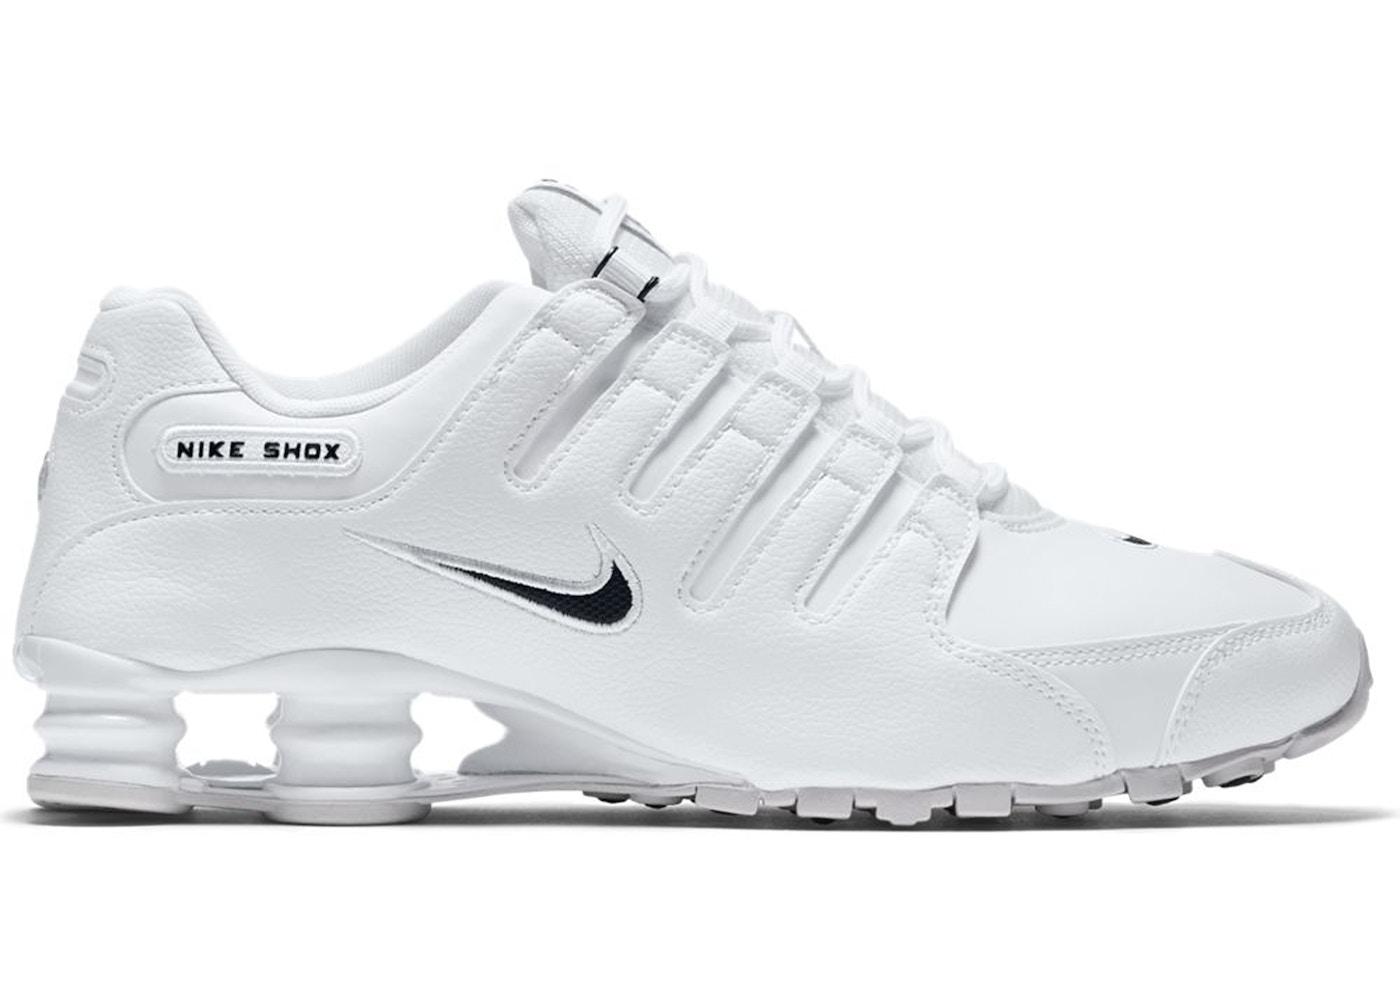 wholesale dealer d5586 f1de5 Nike Shox NZ EU White Black — HypeAnalyzer